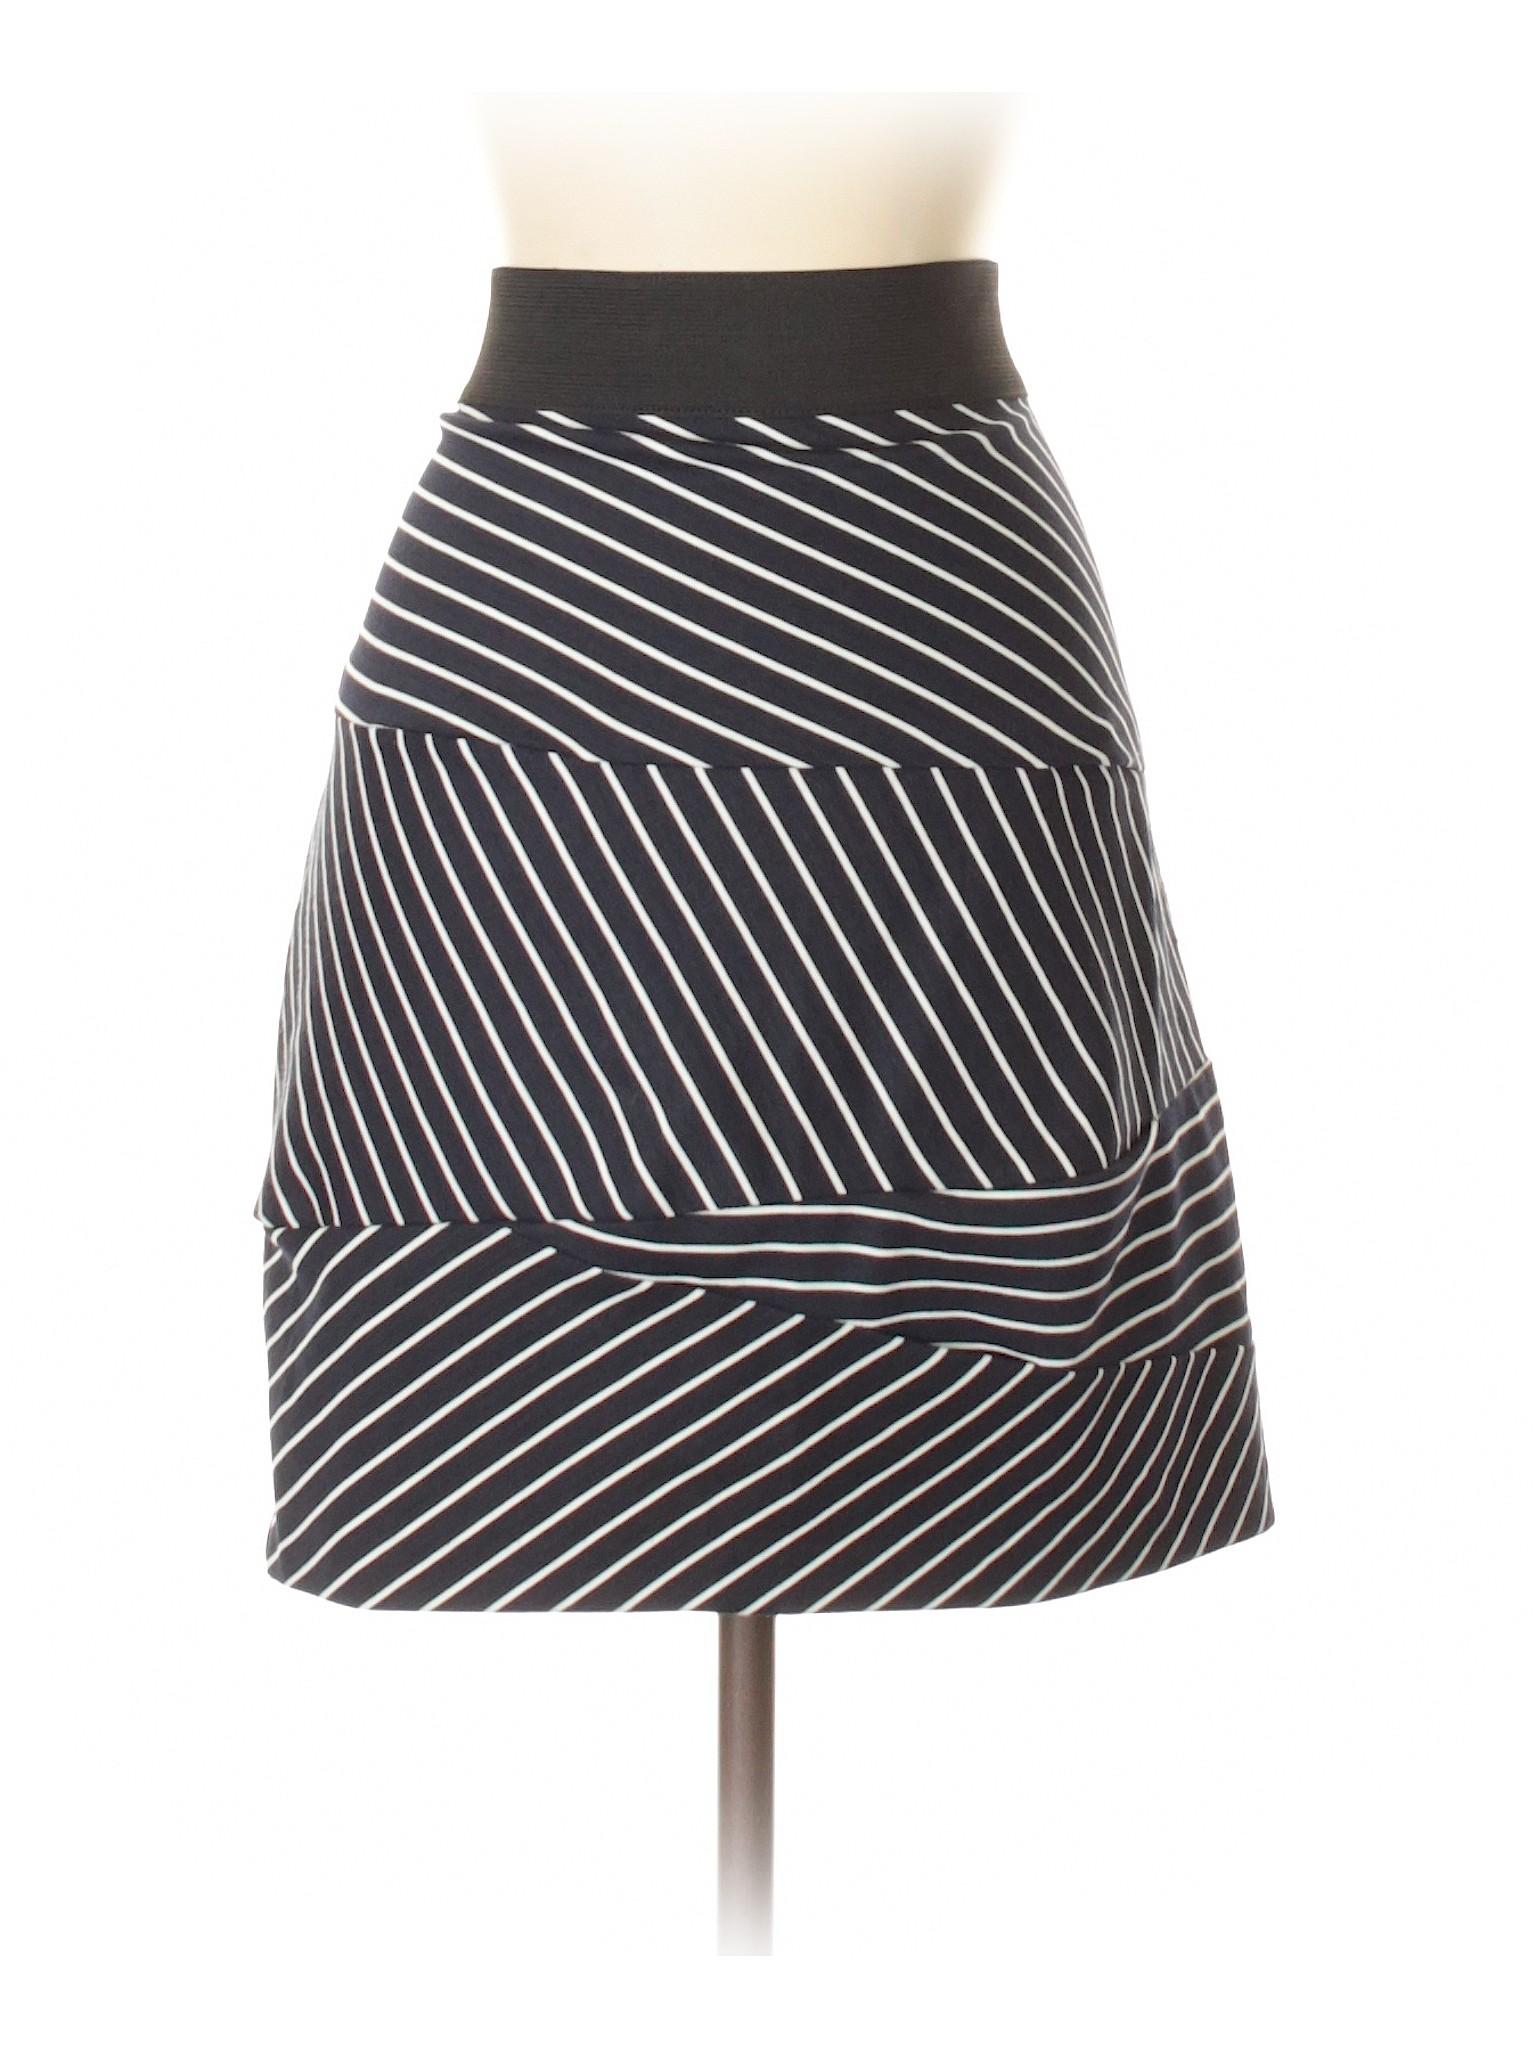 Skirt Boutique Casual Boutique Casual xHOR8O1qw